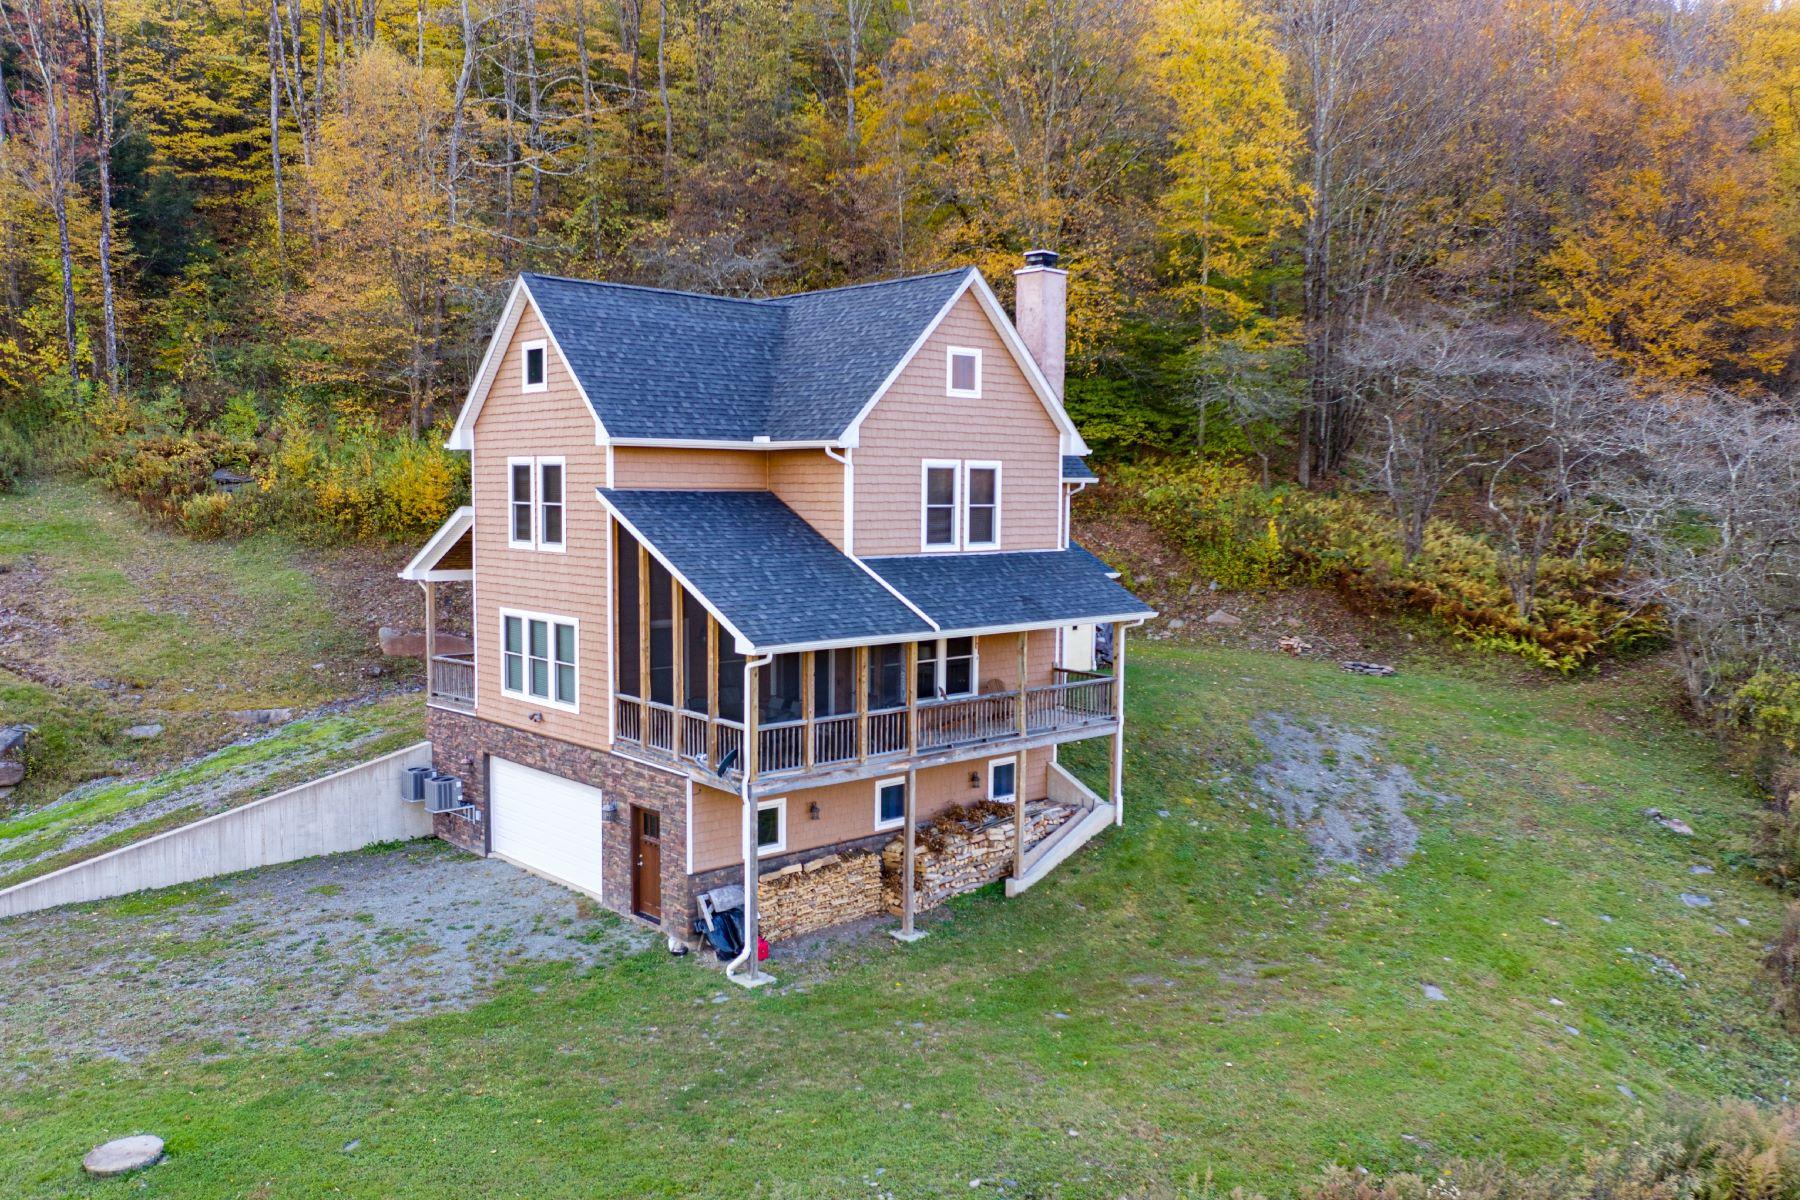 Single Family Homes for Sale at Catskill Mountain Anglers Retreat 2141 Readburn Road Hancock, New York 13783 United States